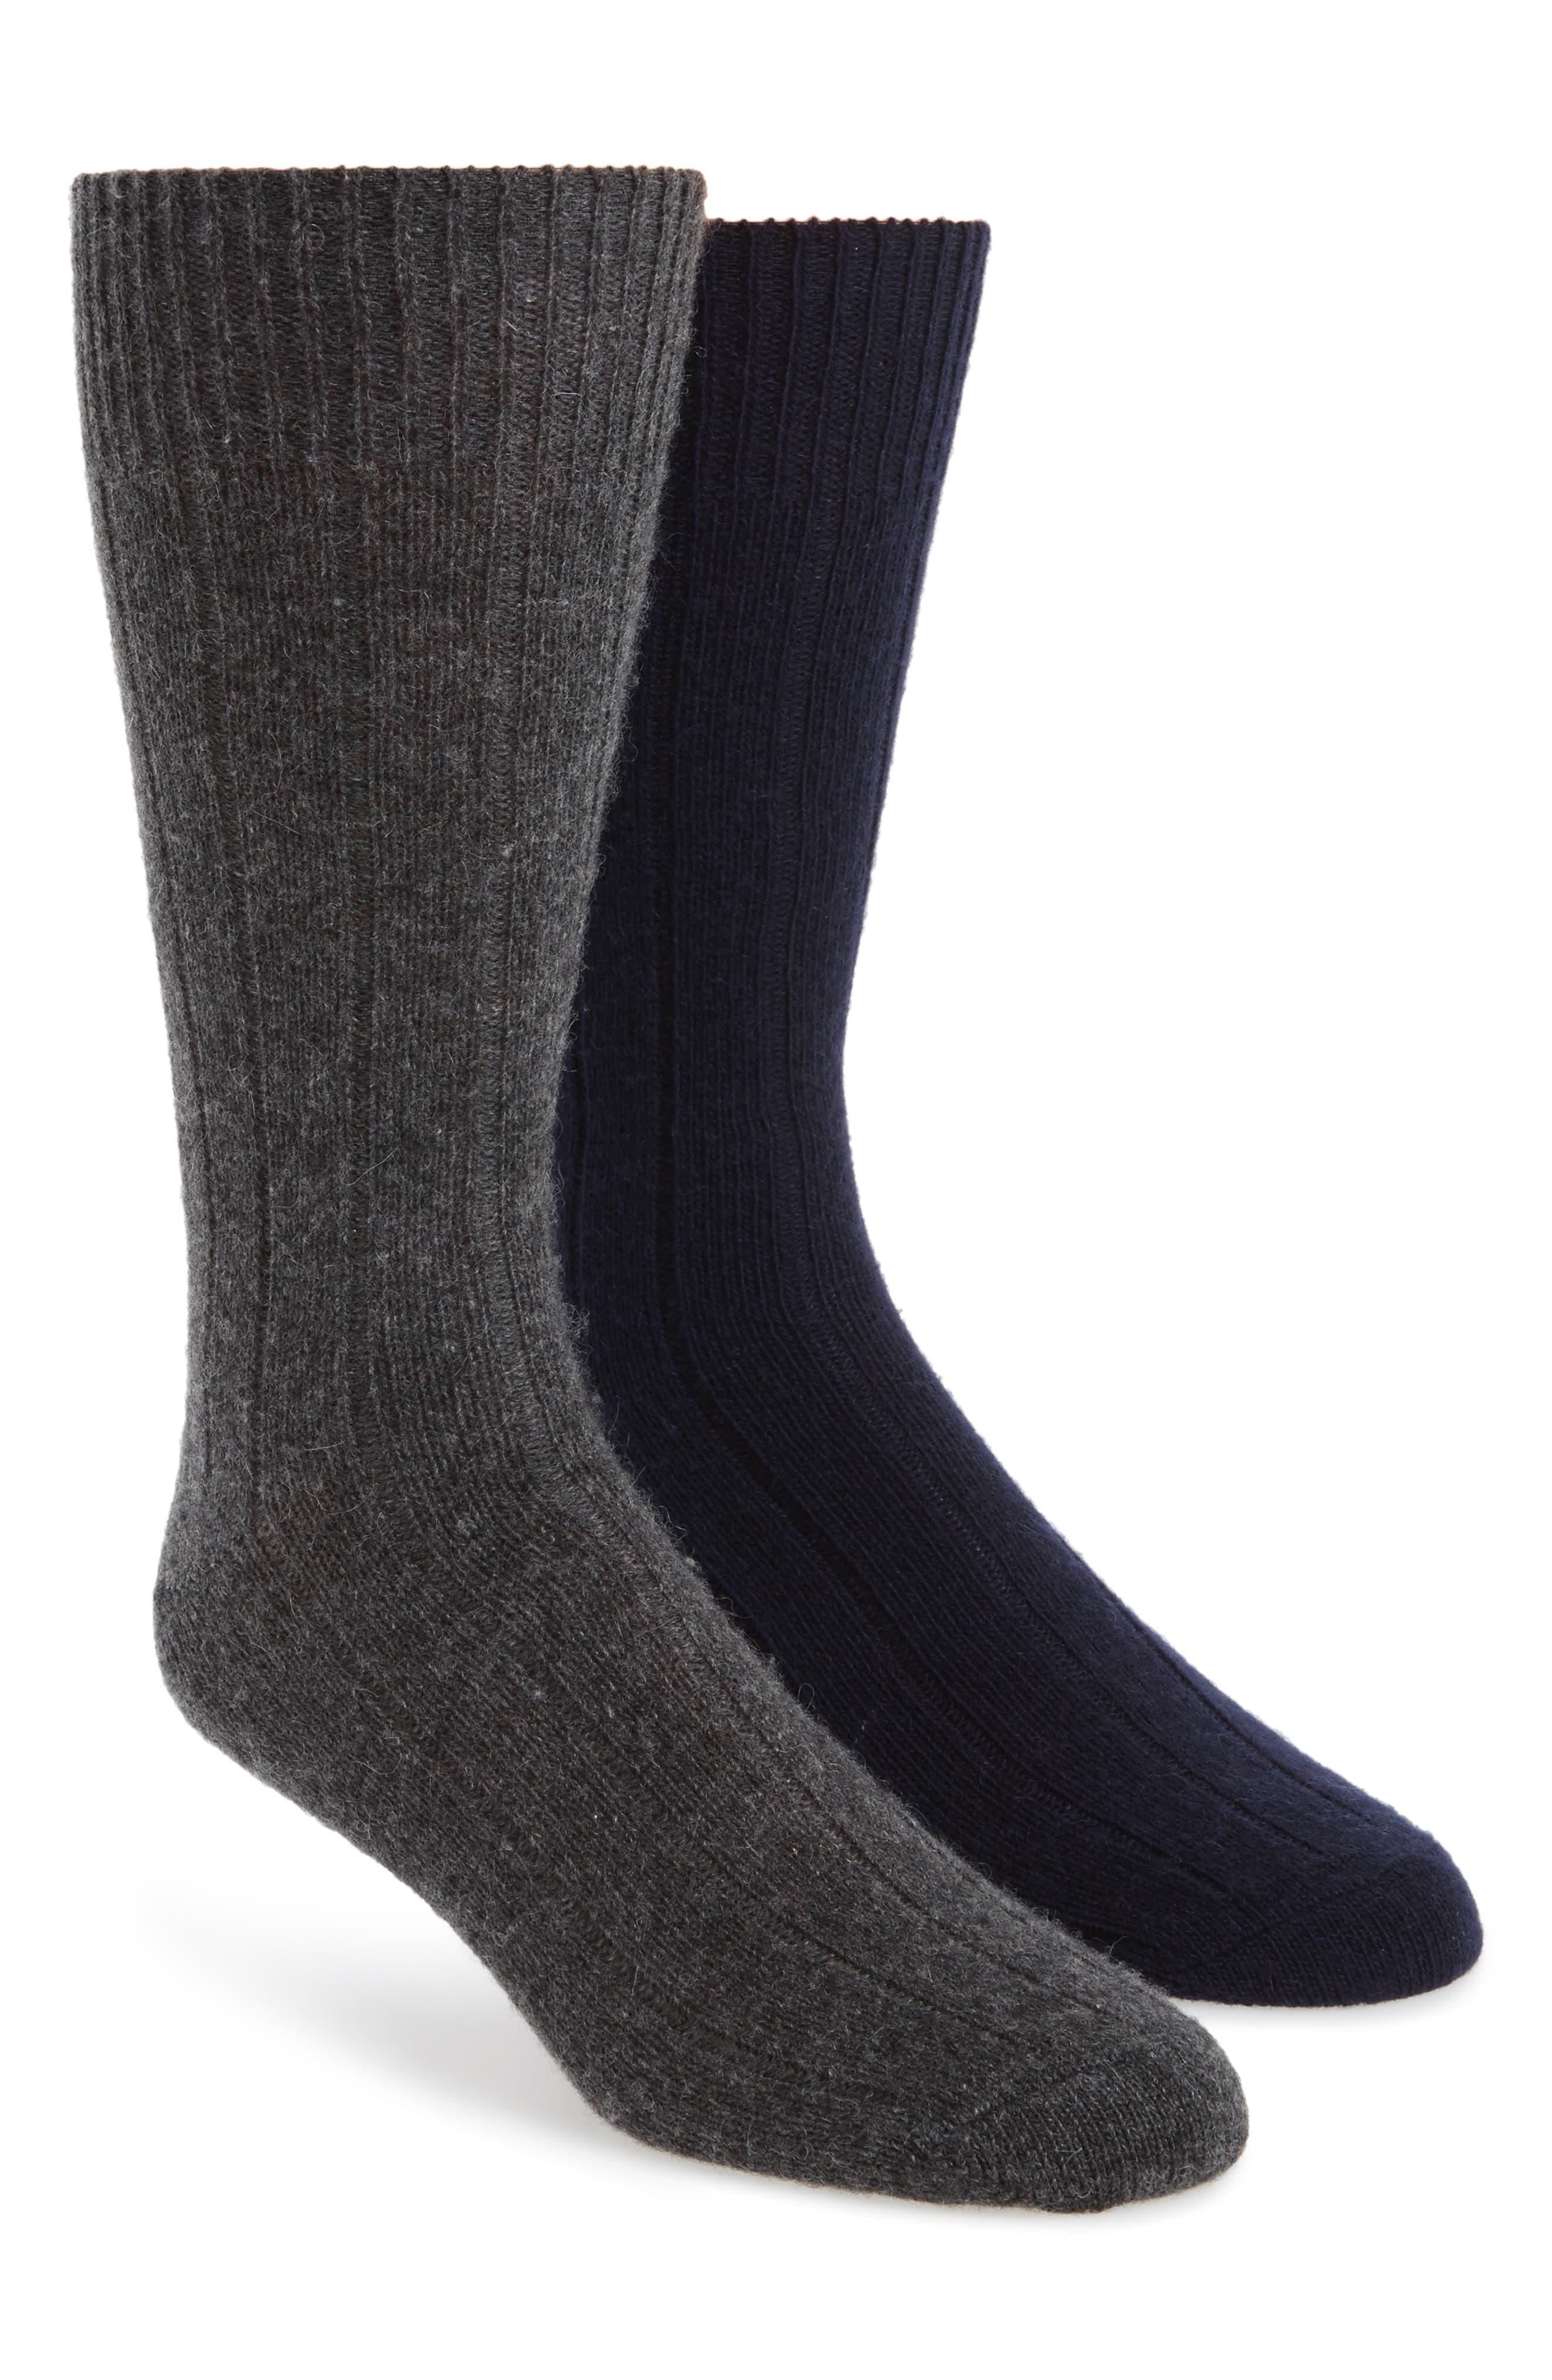 2-Pack Cashmere Blend Socks Box Set,                         Main,                         color, Navy/ Charcoal